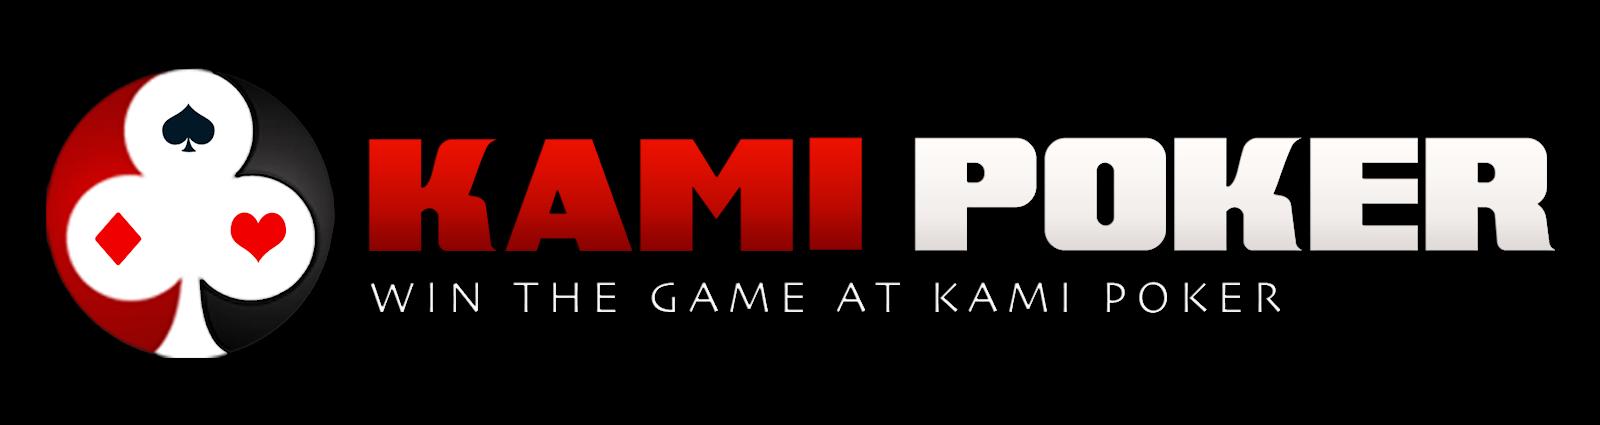 Link Alternatif KamiPoker Resmi 2019 | Alternative Link